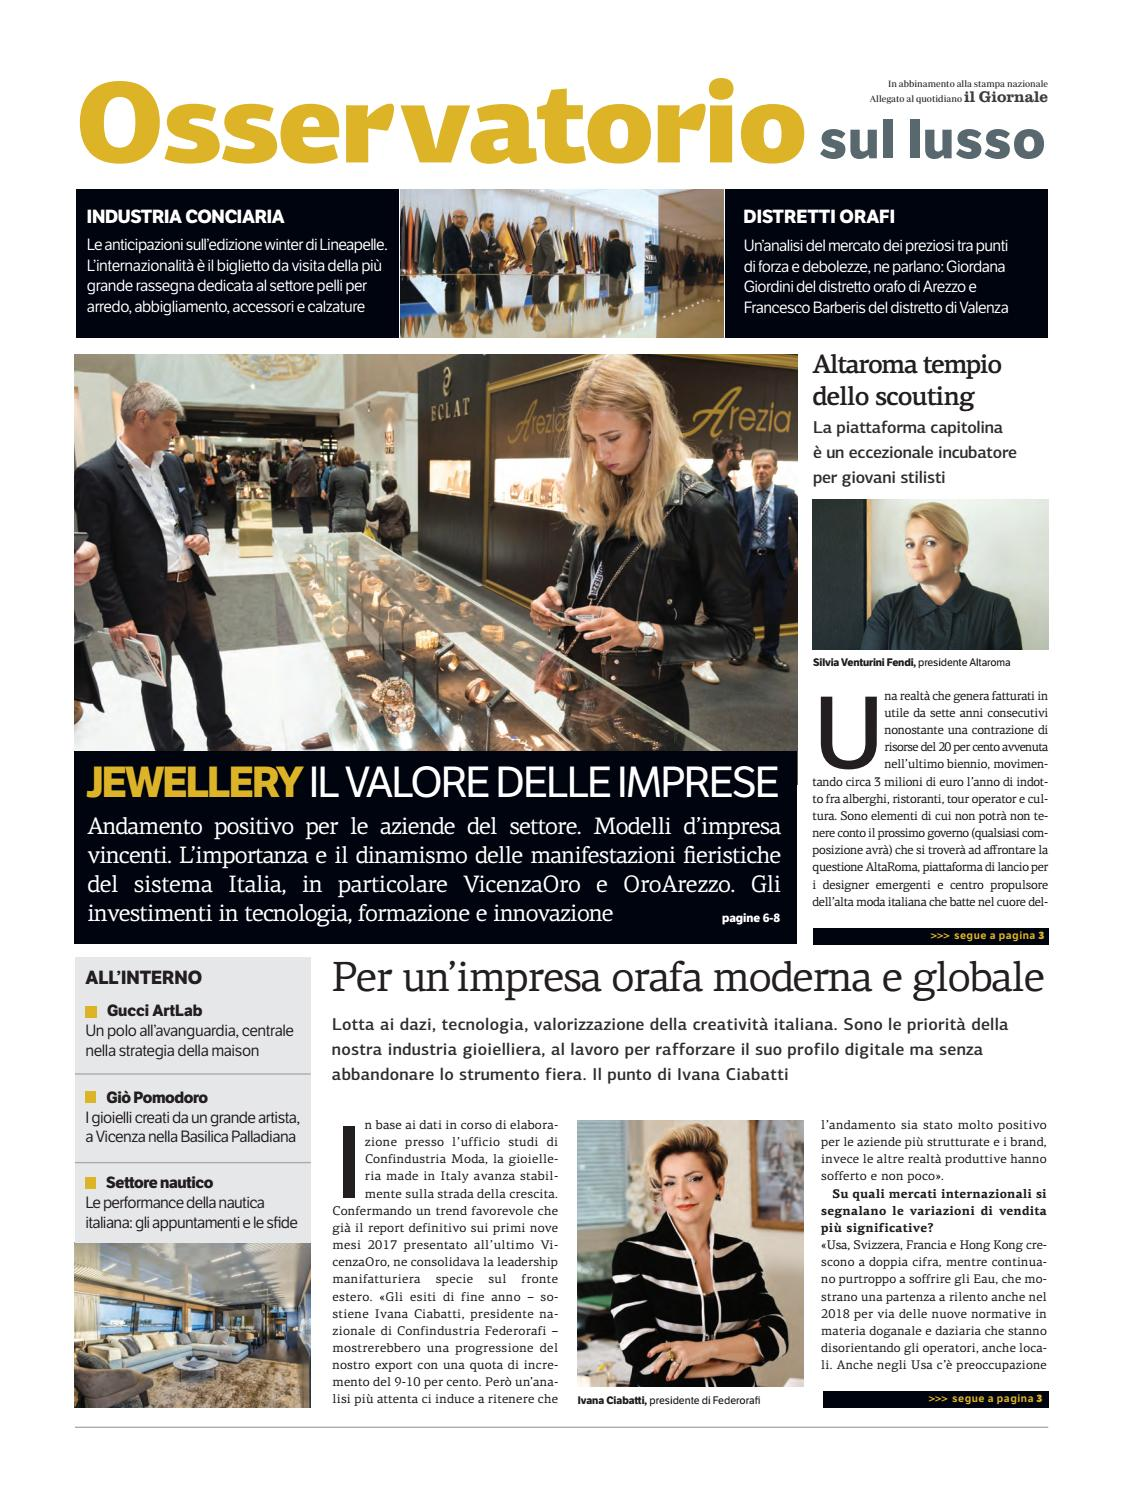 Oss Lusso - Maggio 2018 by Golfarelli Editore International Group - issuu e023d0a534e